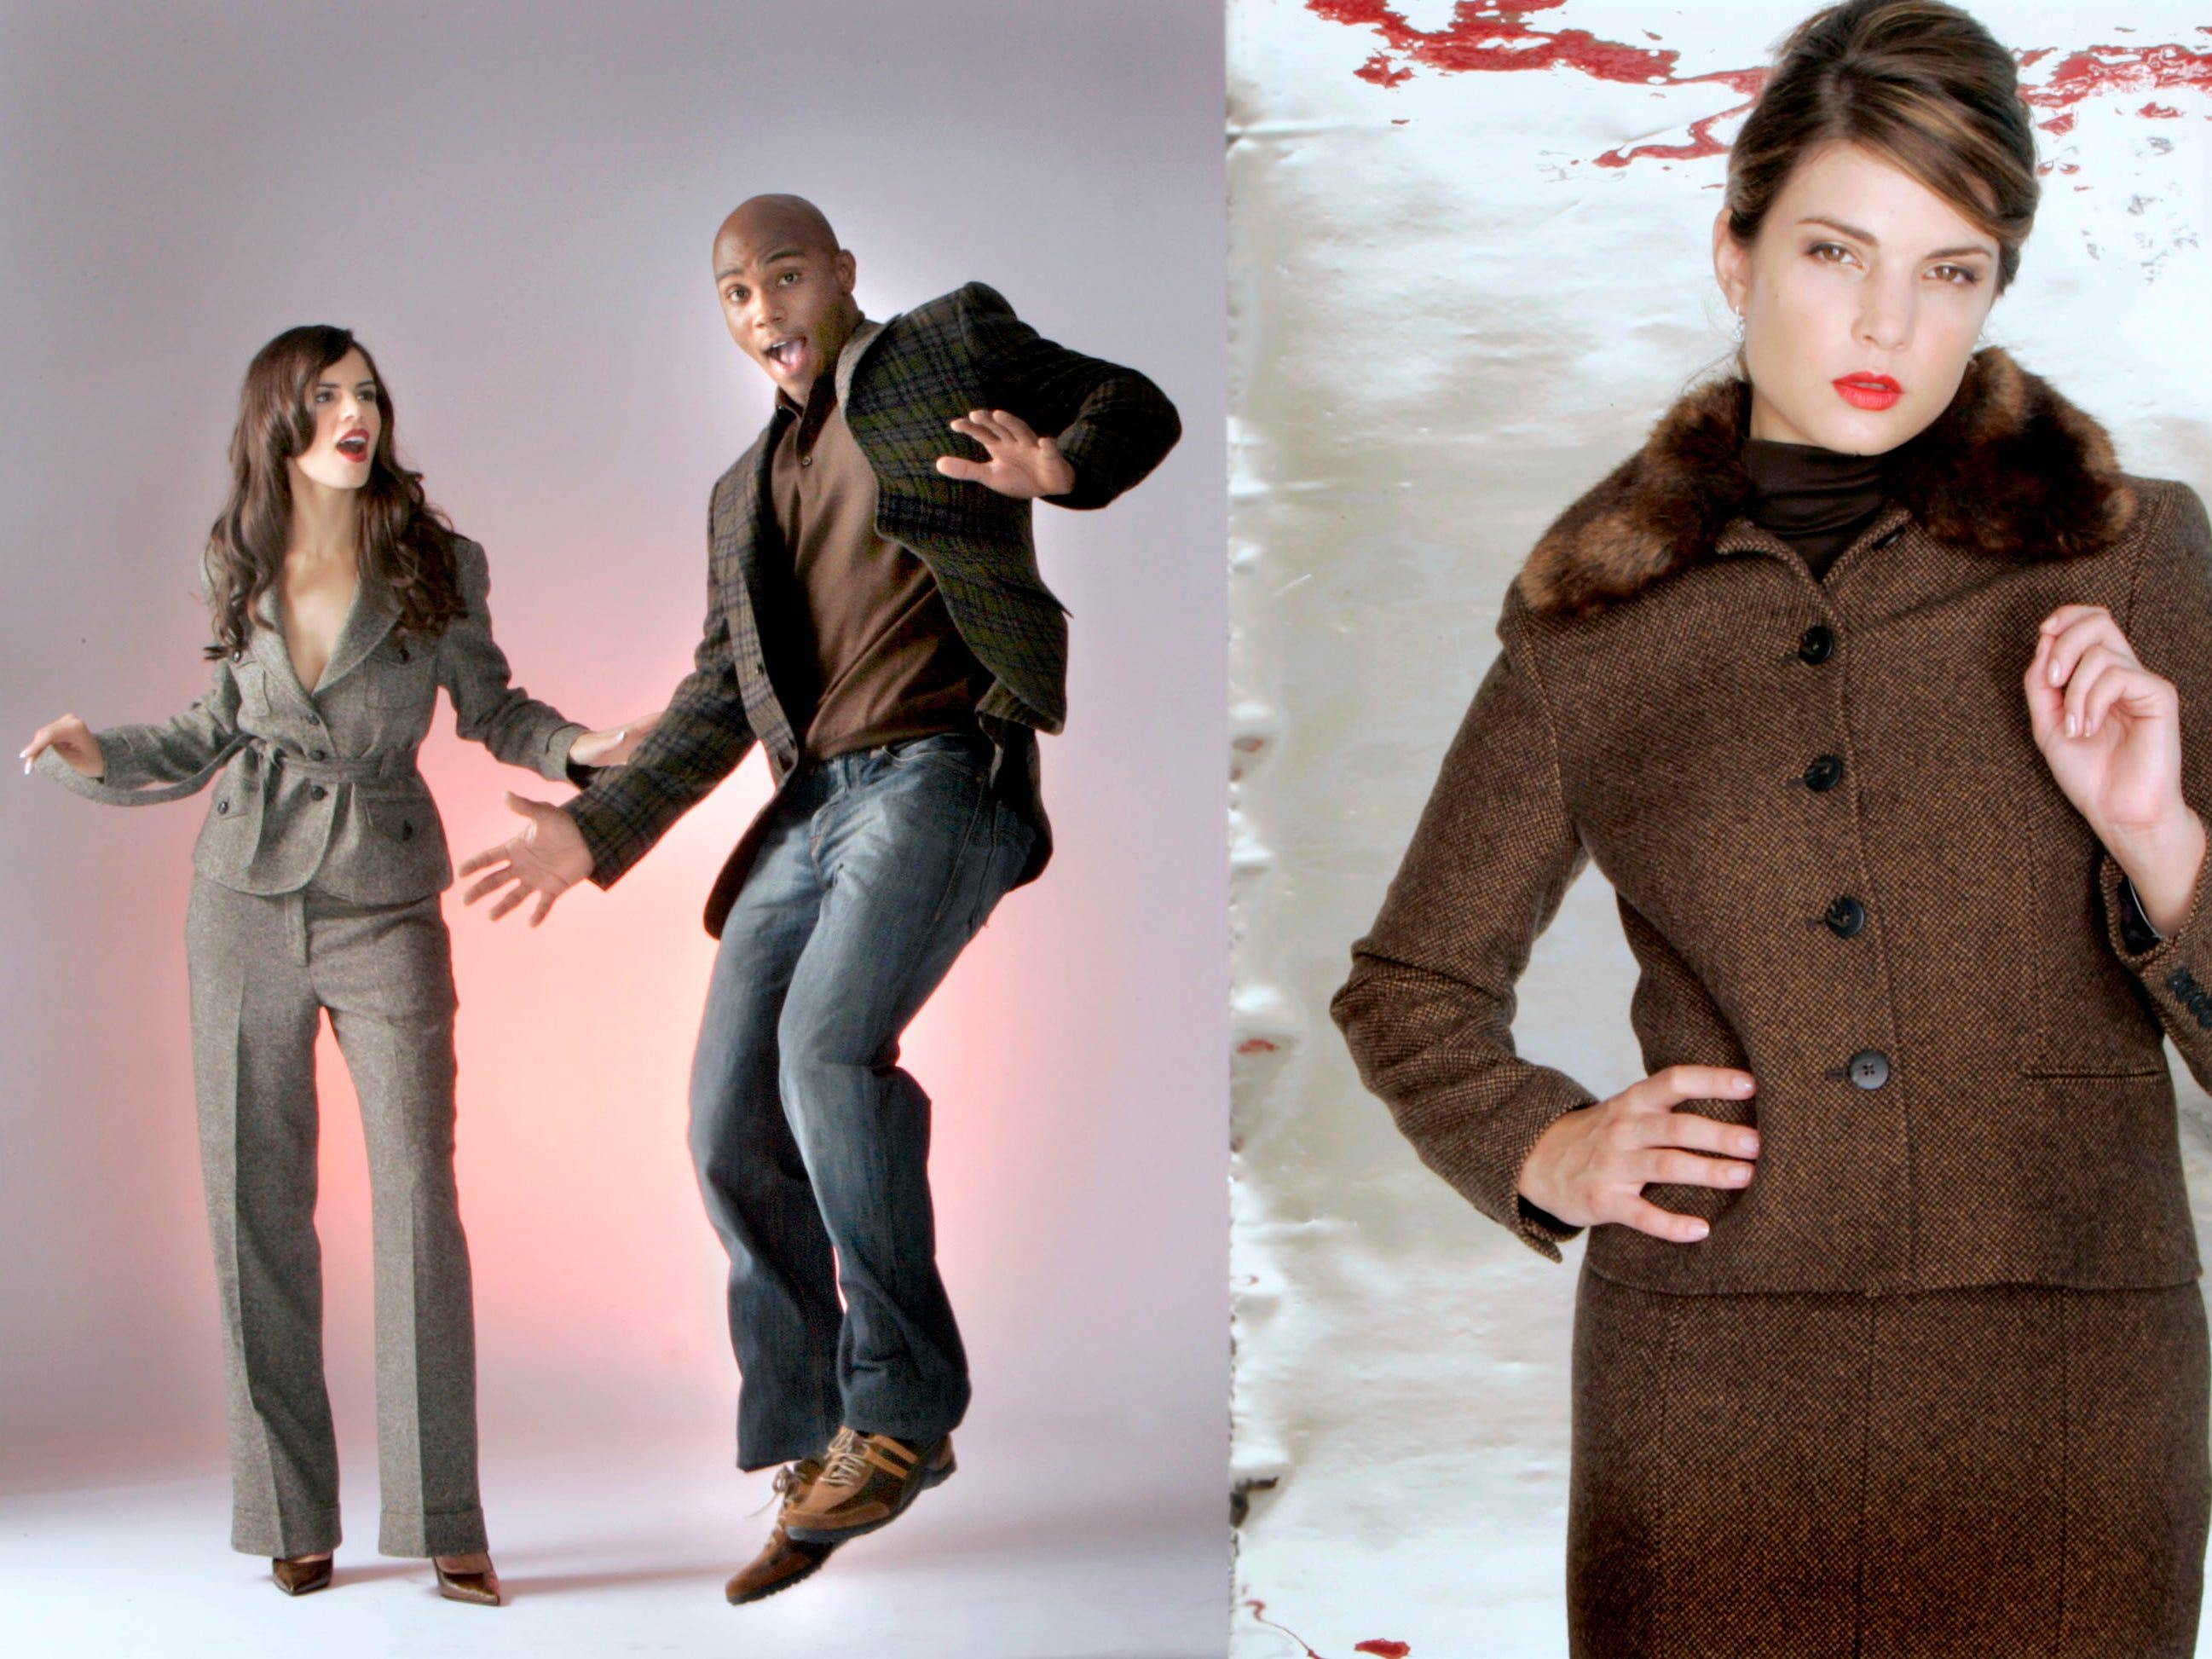 "On him, Trussini ""Linea Classico"" plaid sportcoat, $925, Gran Sasso cashmere sweater, $235, at Harleys."